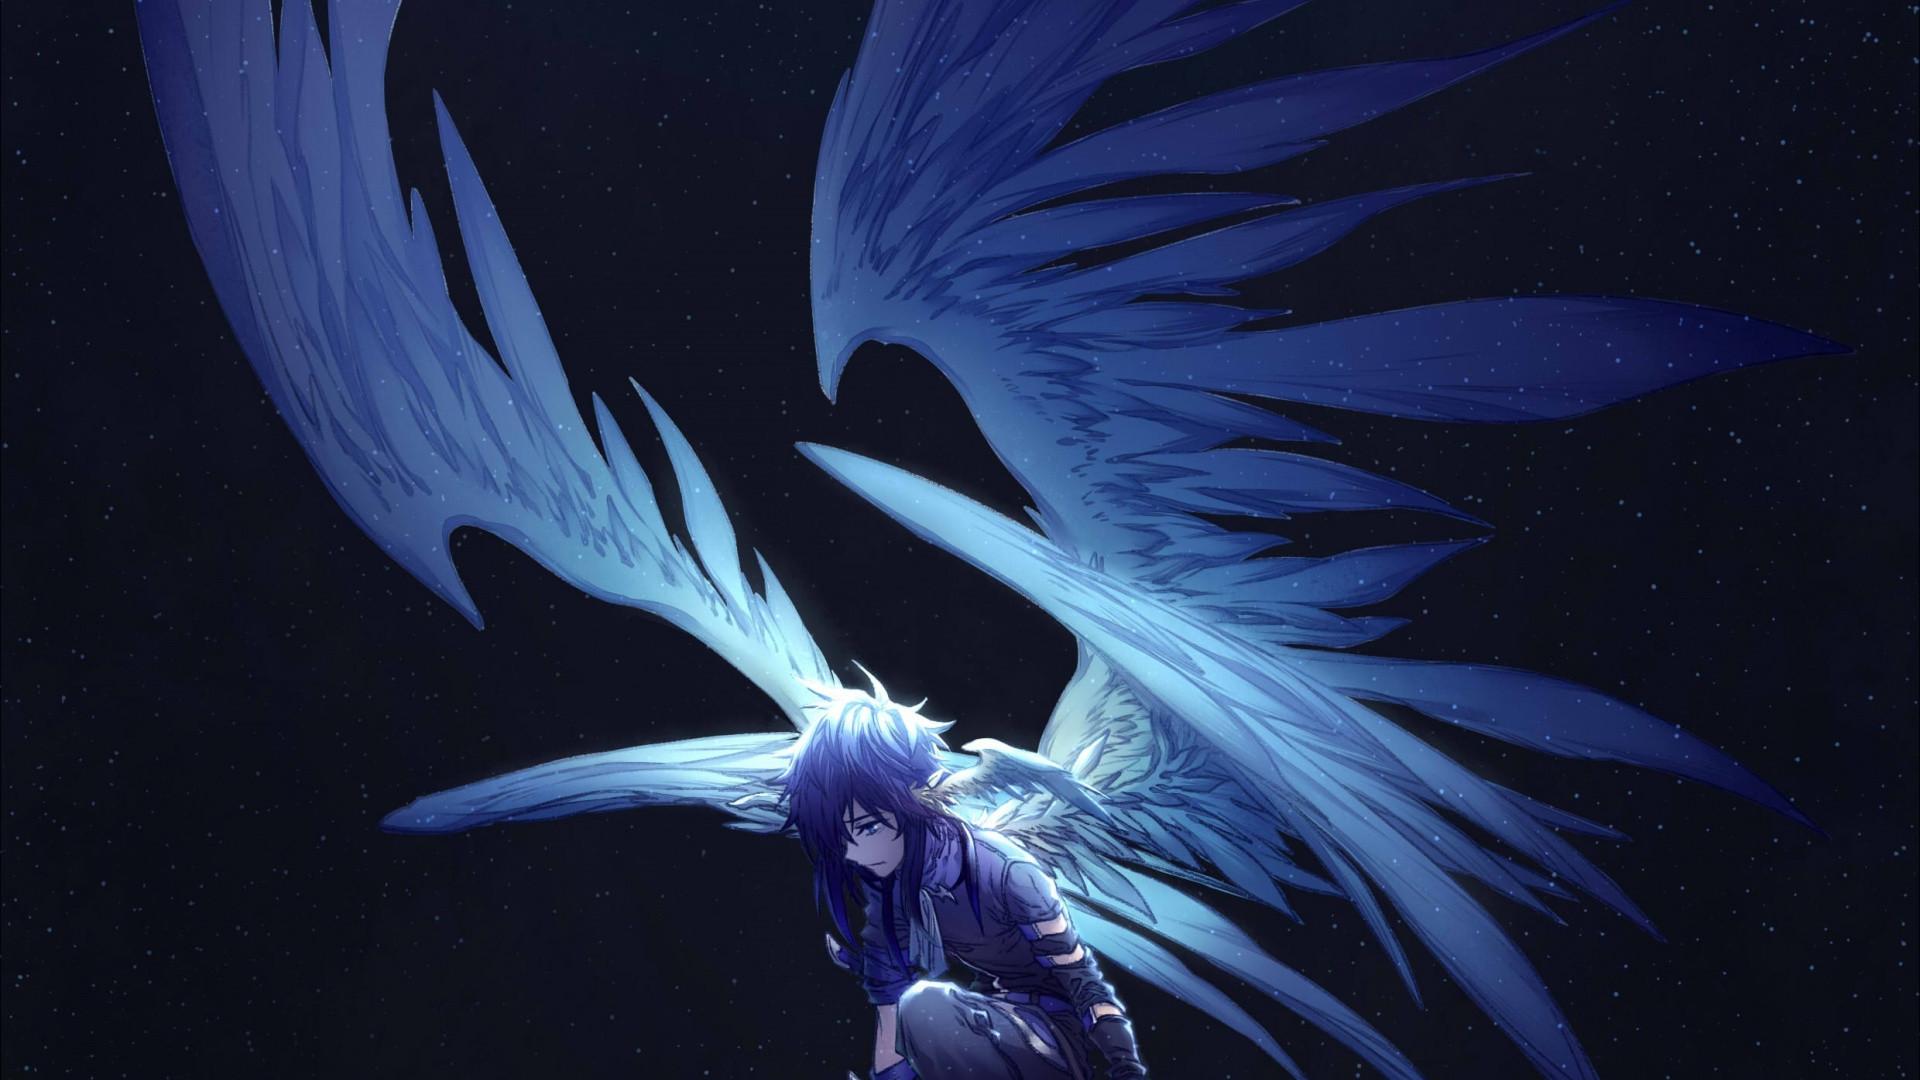 Res: 1920x1080, Dark, big wings, angel, fantasy, anime,  wallpaper